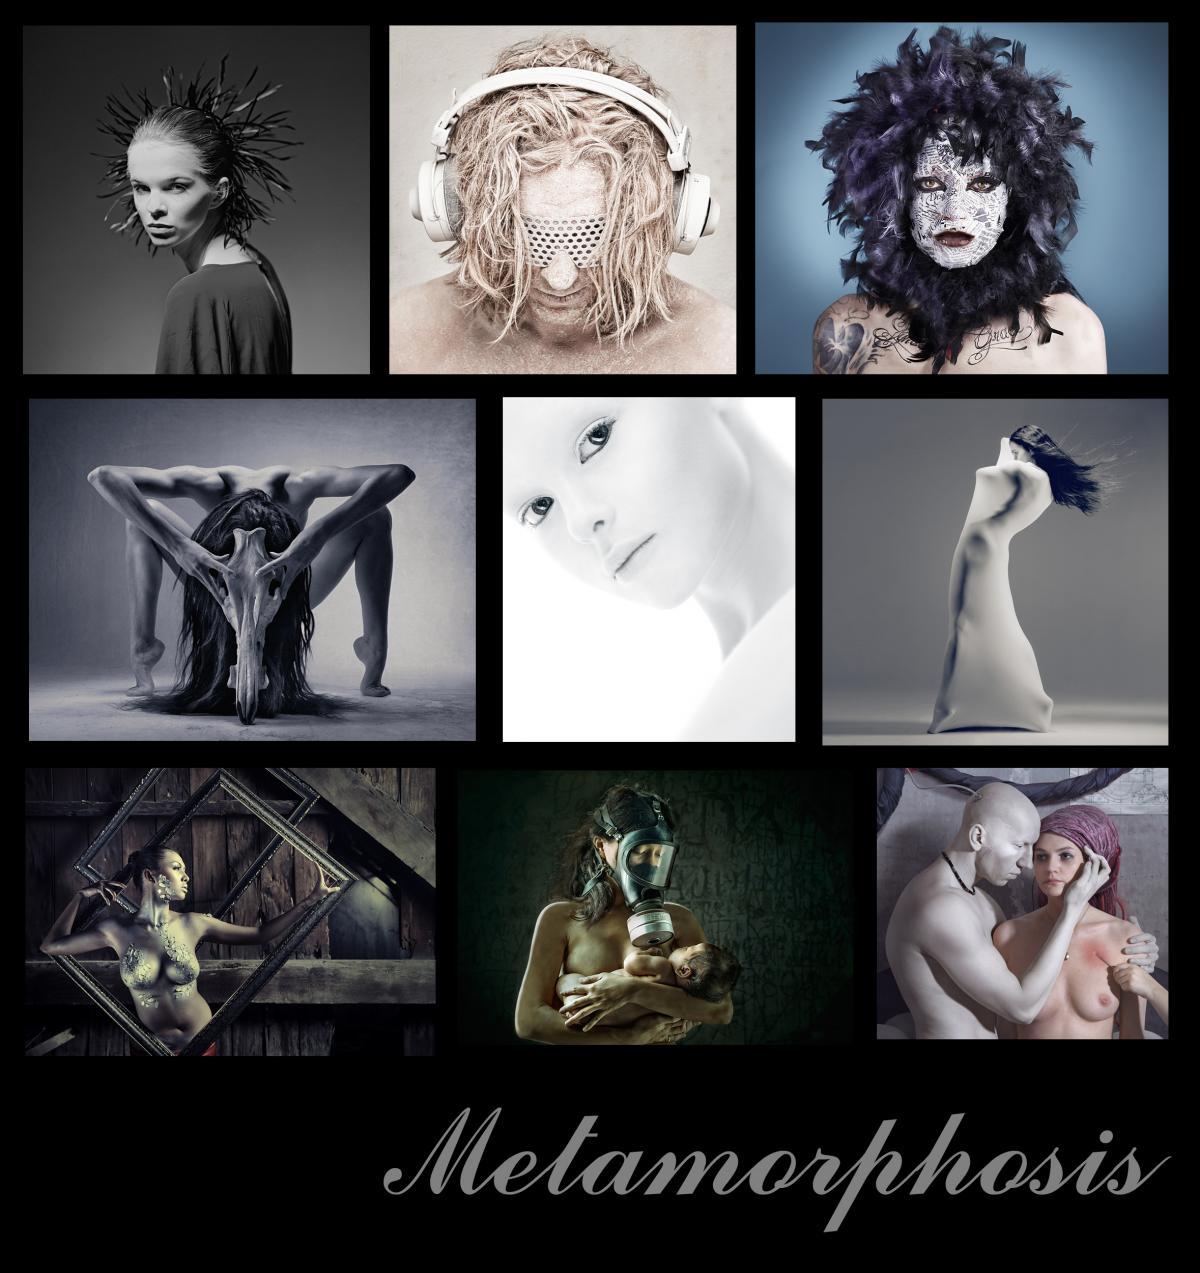 metamorphosis-locandina.jpg